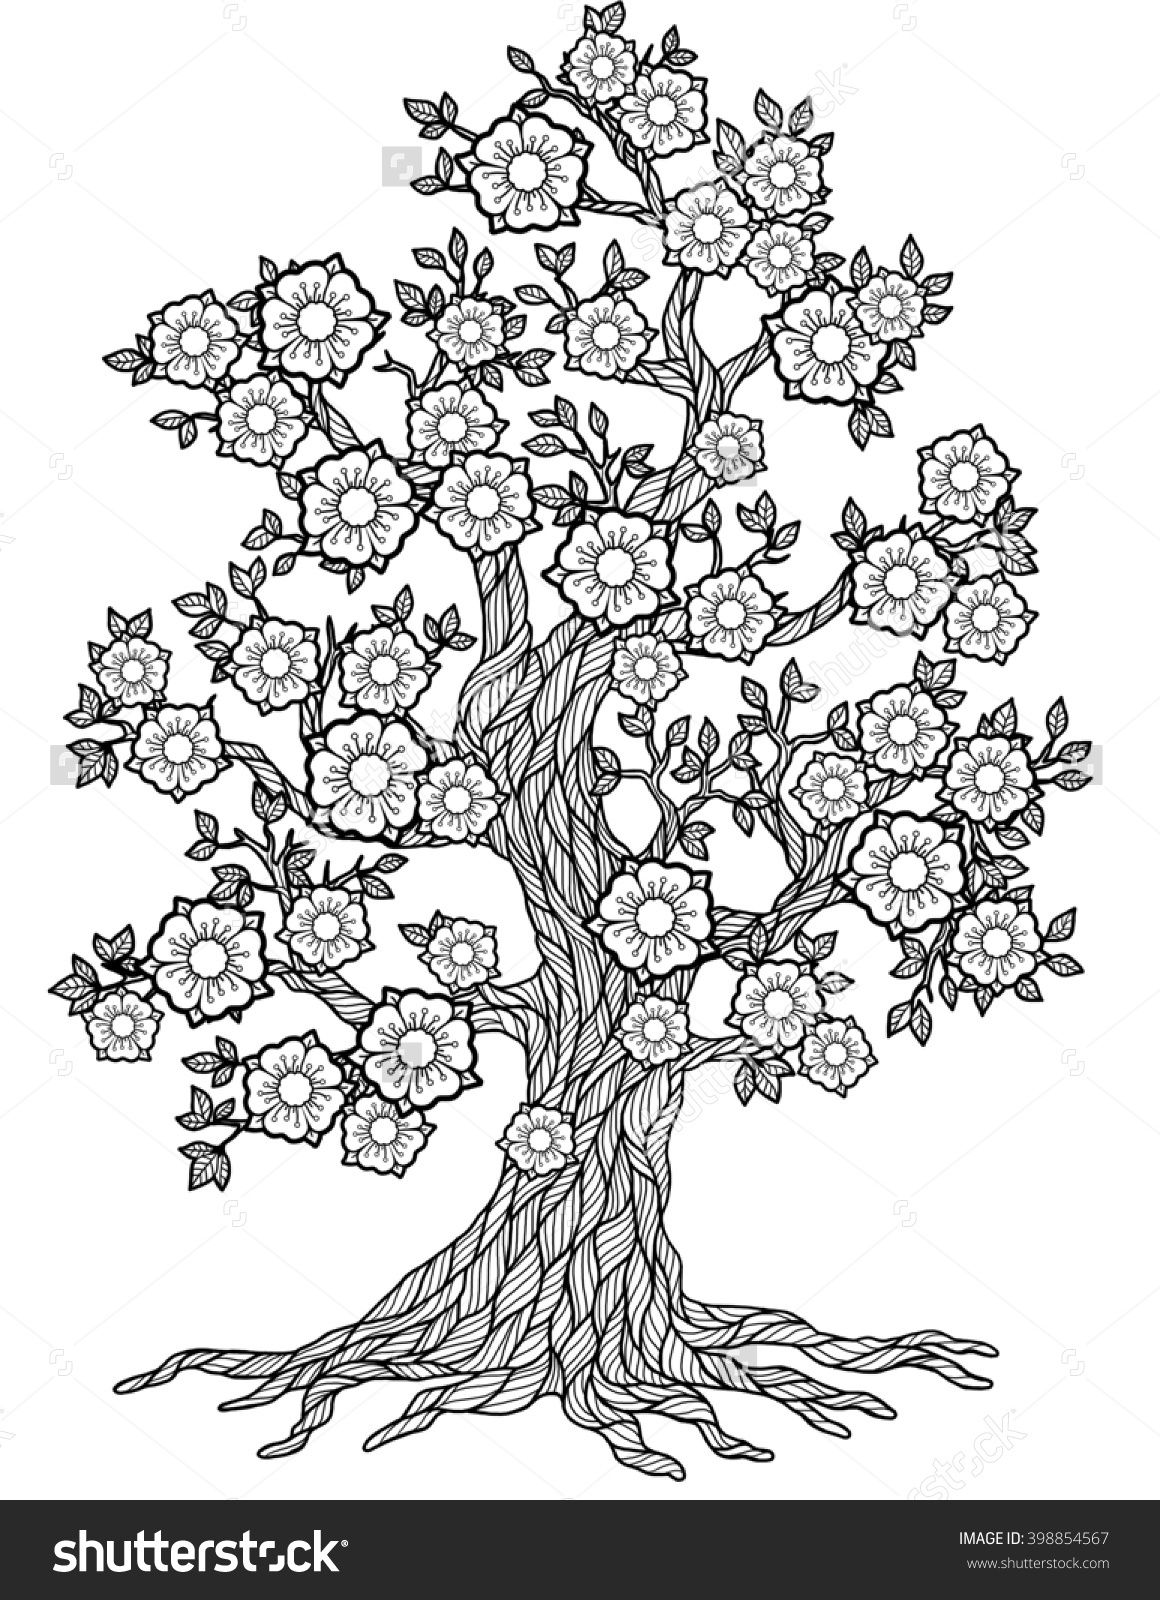 Pin On Drawing [ 1600 x 1160 Pixel ]